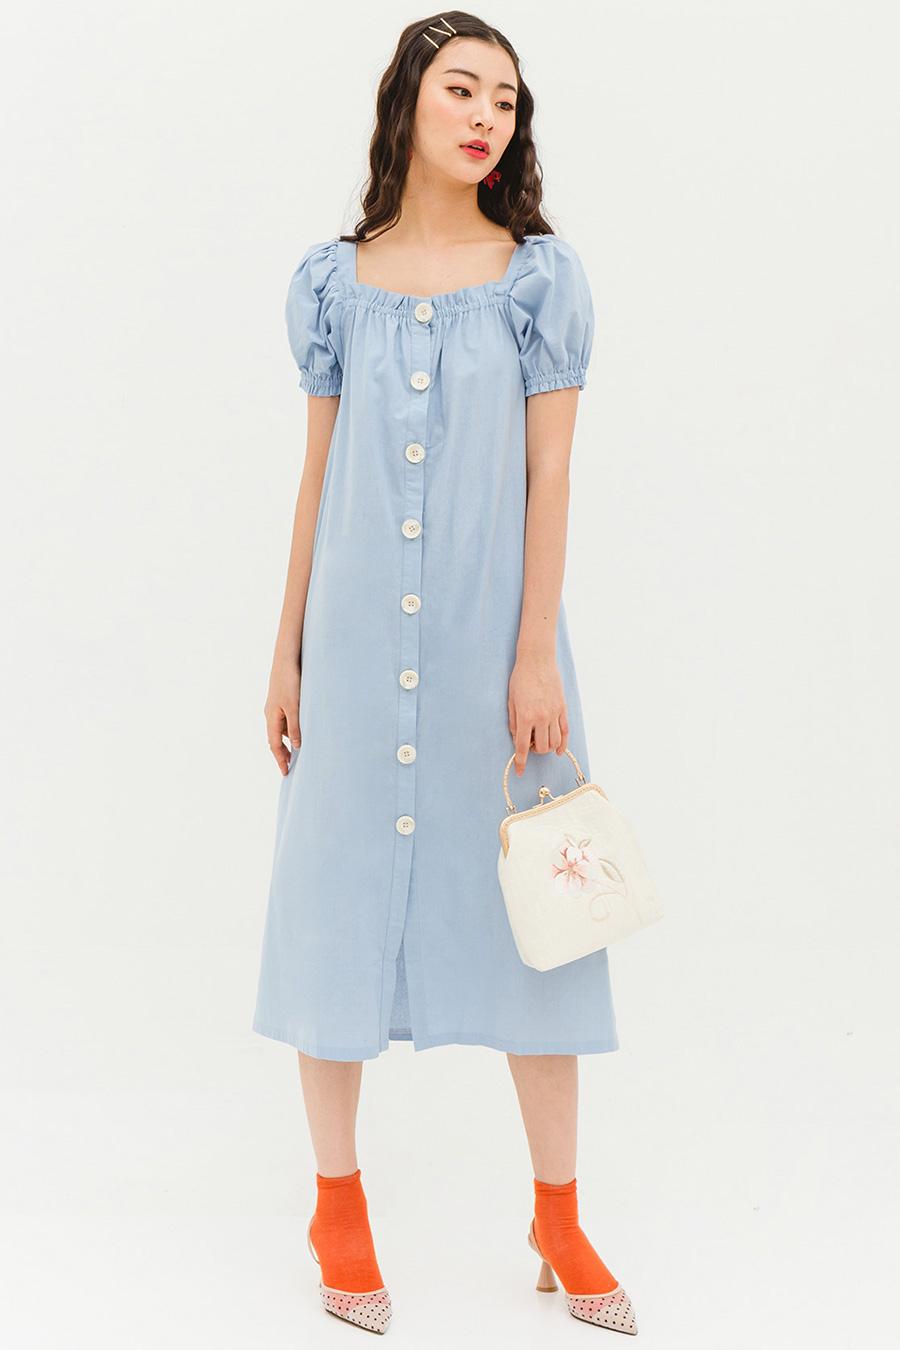 ESTELLE DRESS - POWDER [BY MODPARADE]